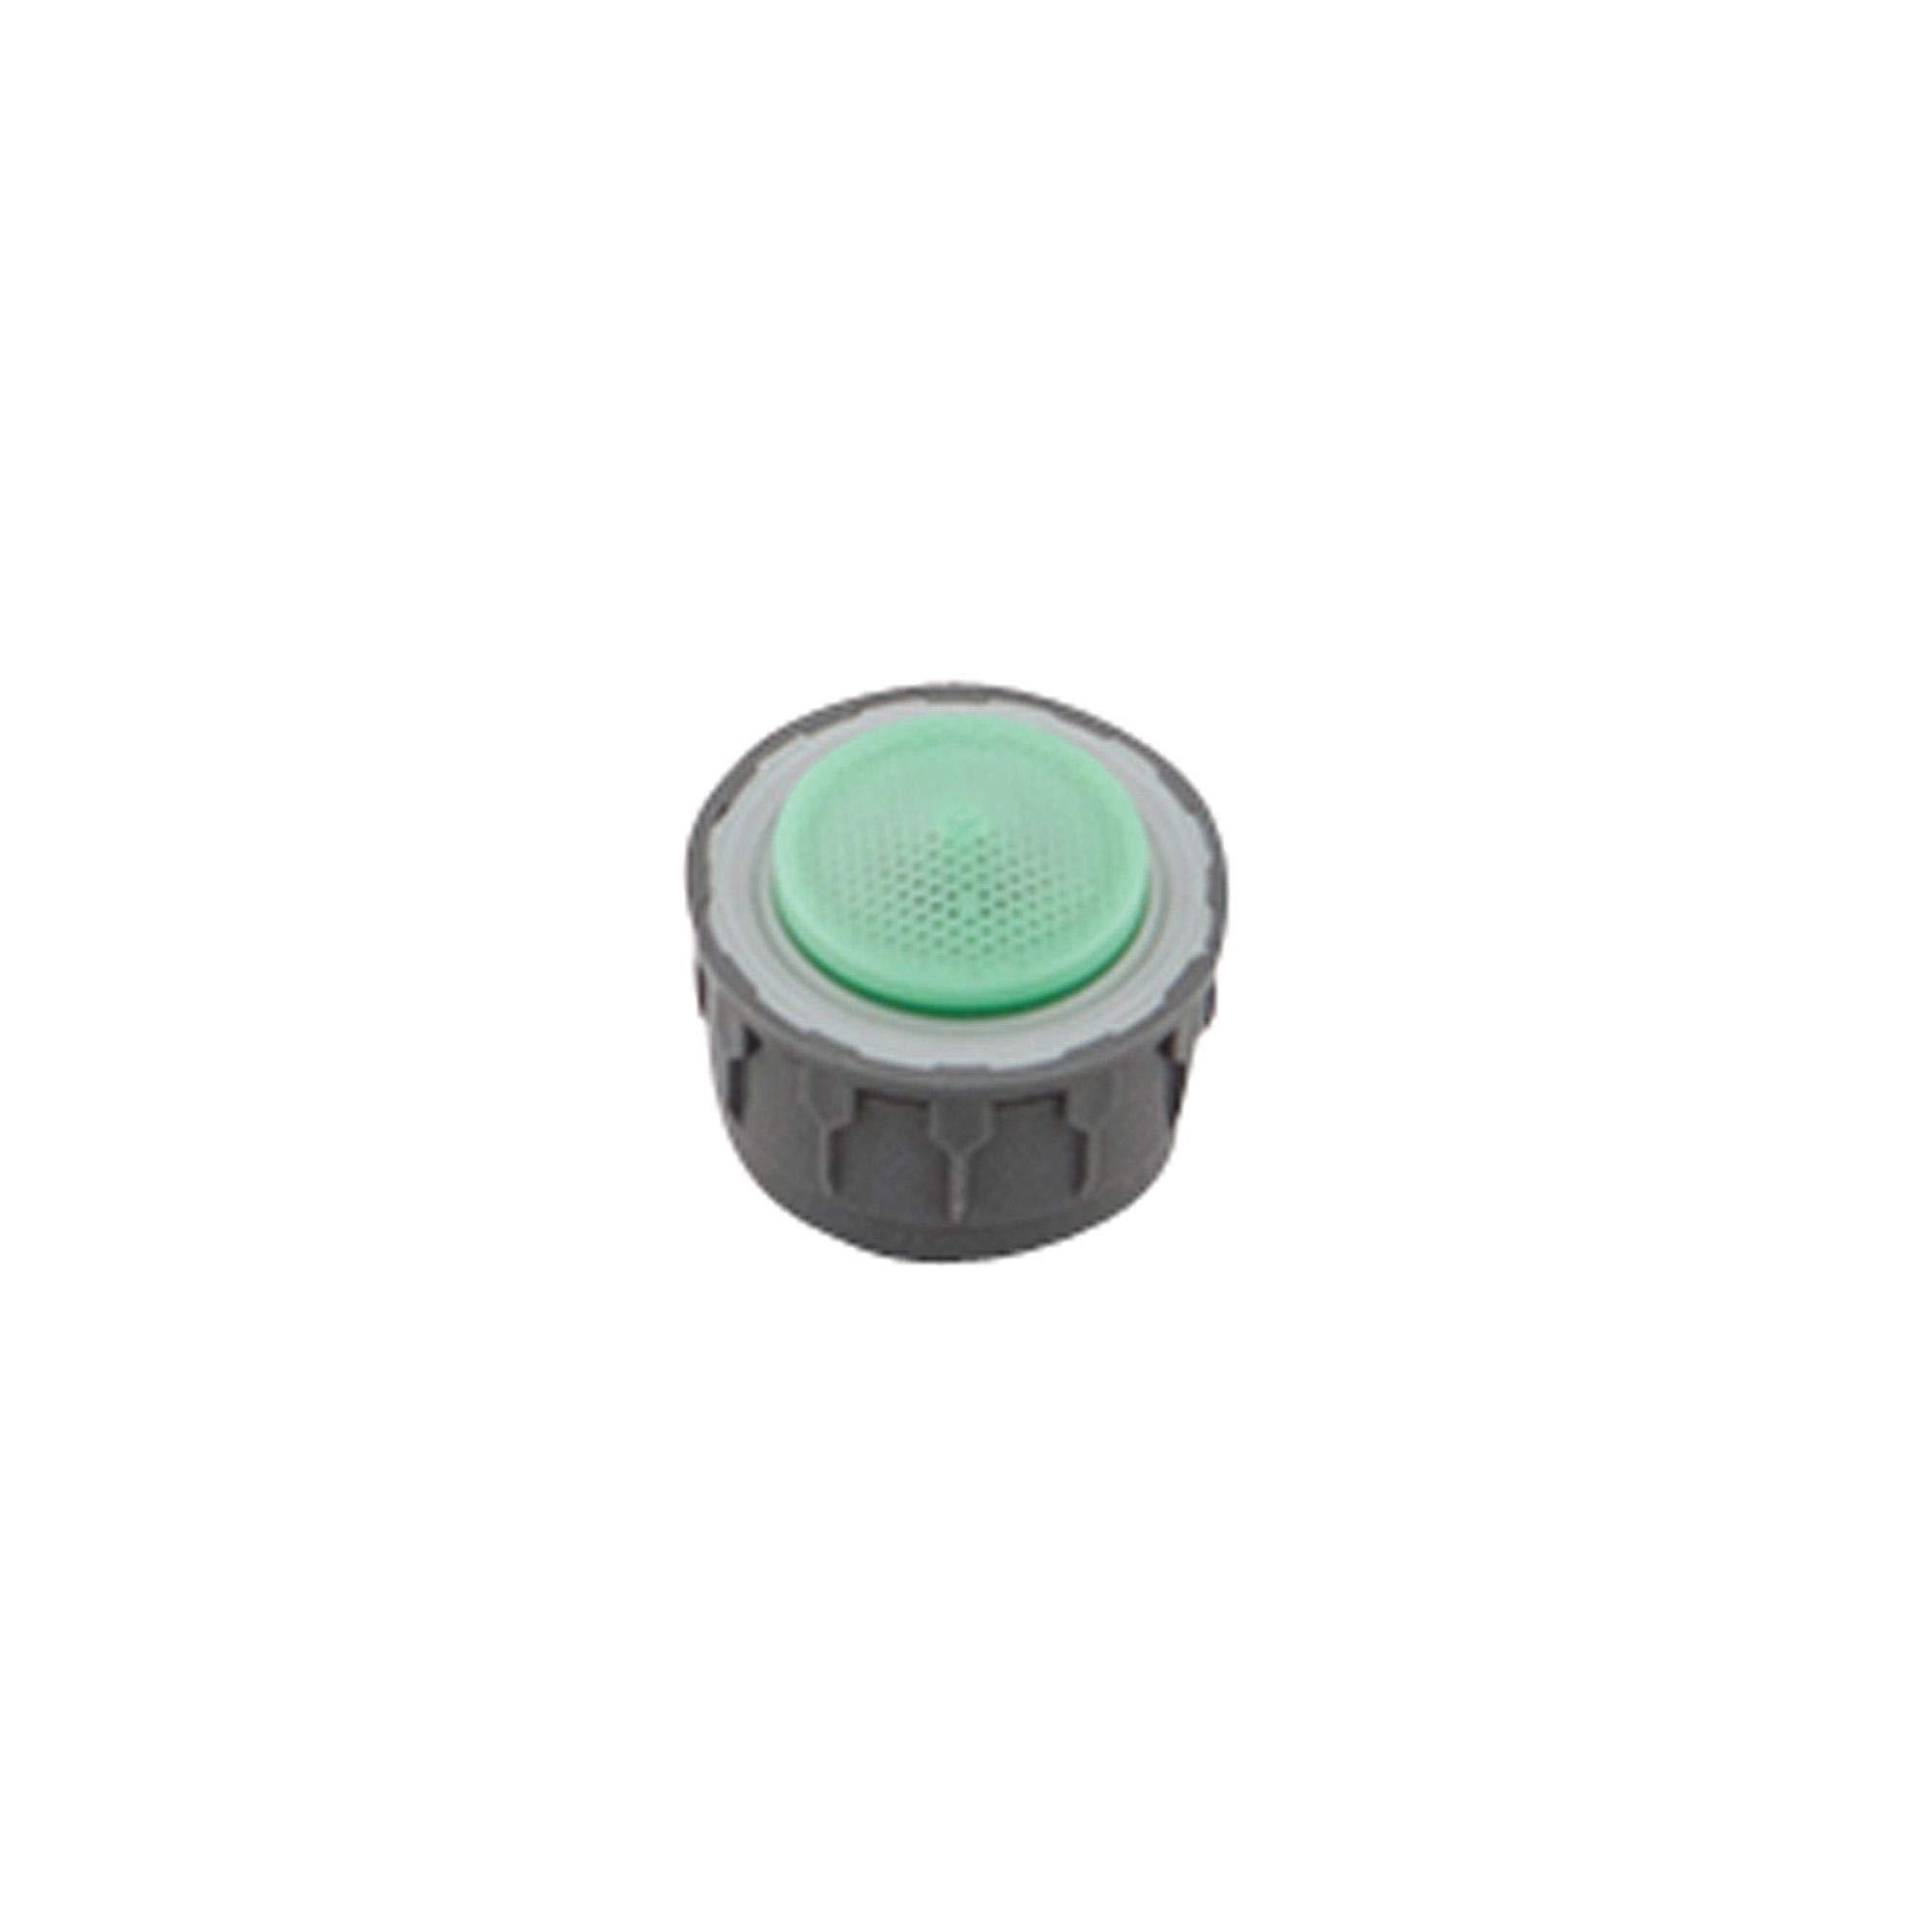 Moen 116711 Eco-Performance Aerator Flow Restrictor, 1.5 Gpm - Aerator Insert